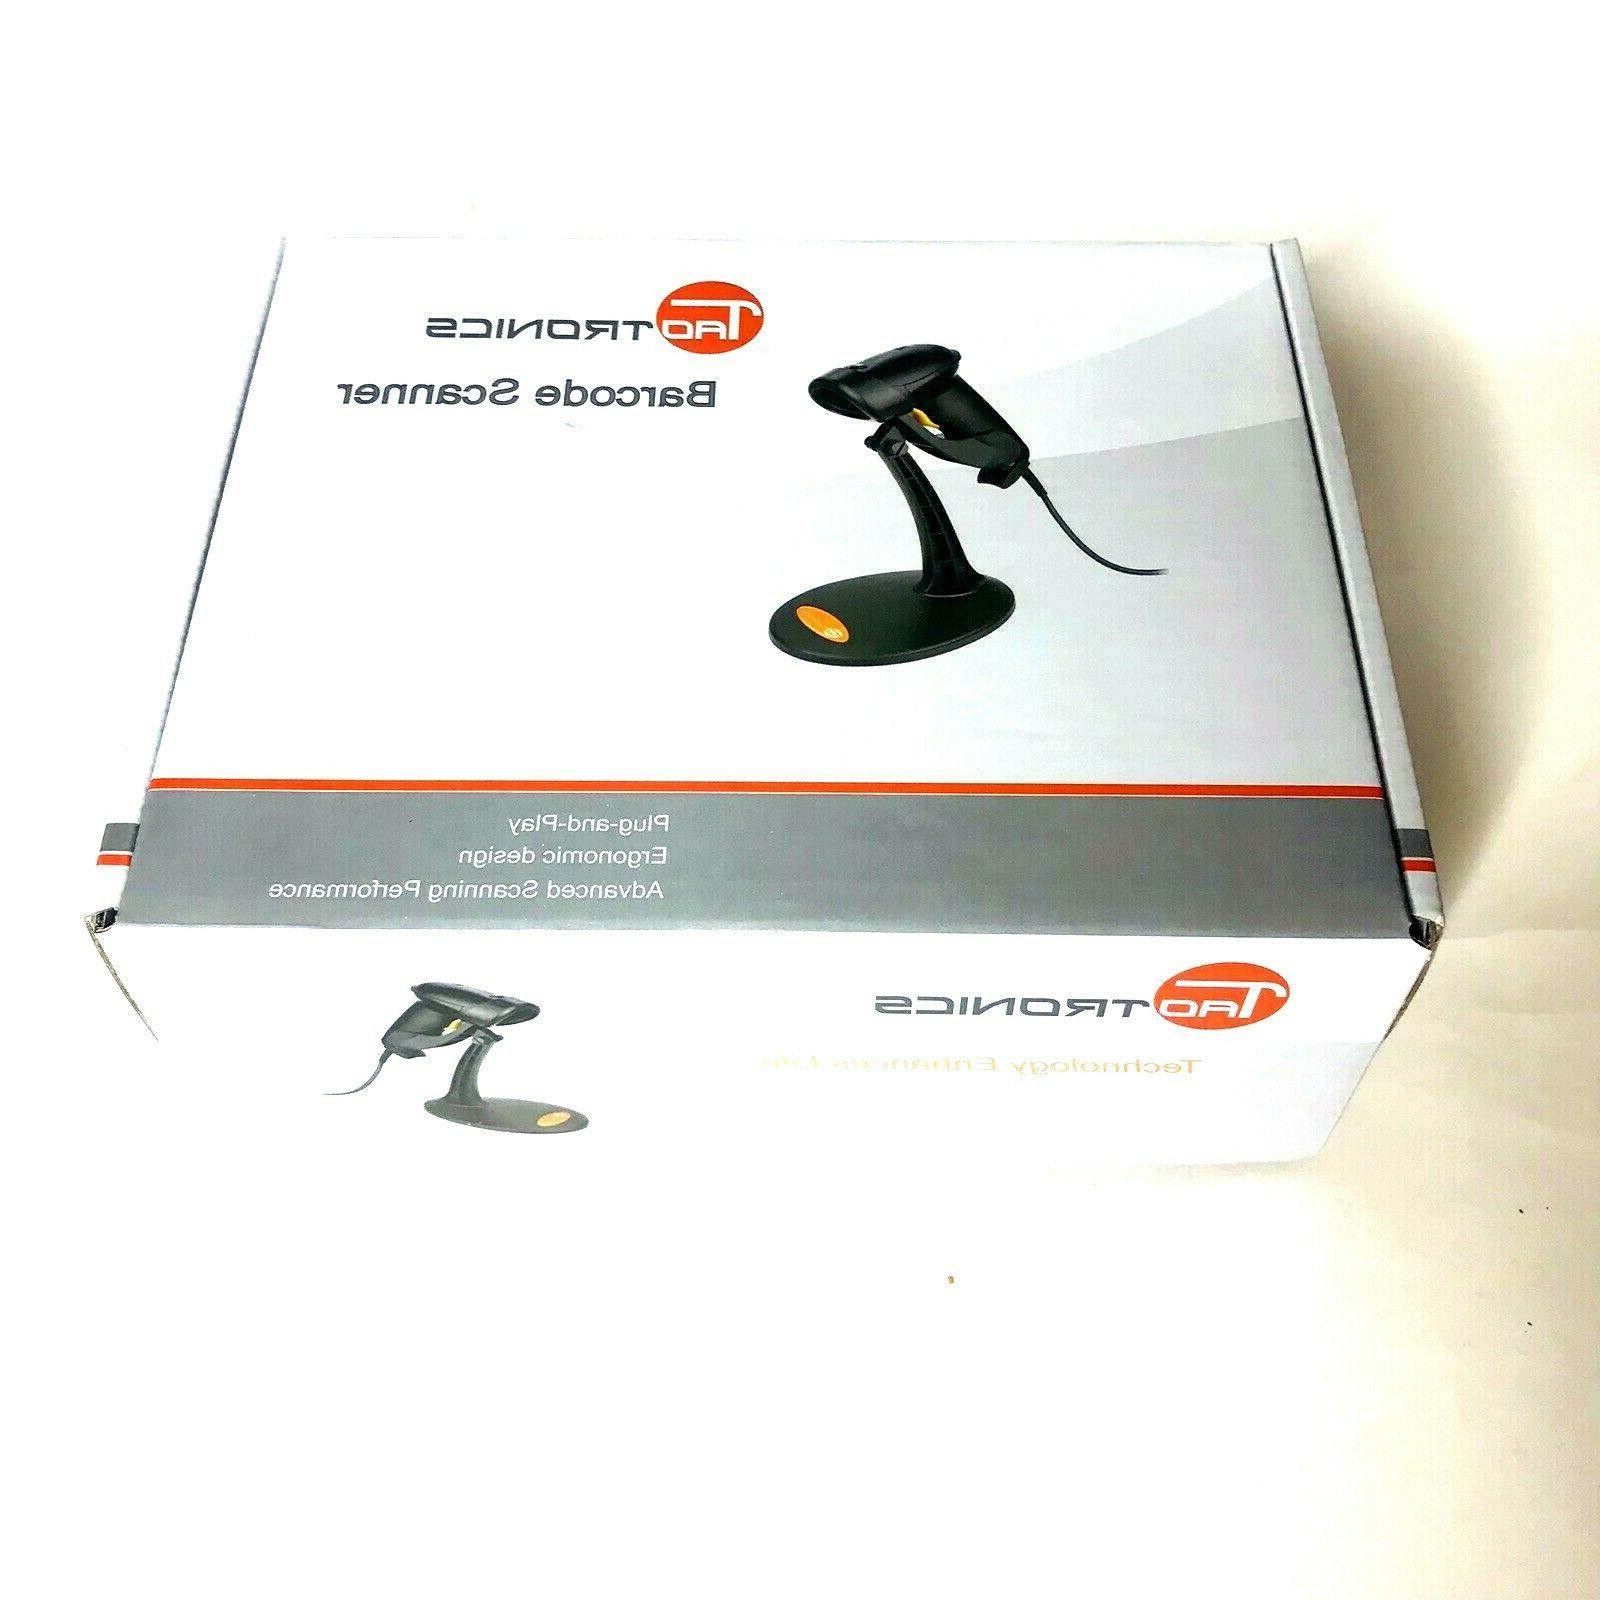 TaoTronics Wired Scanner model: In Black